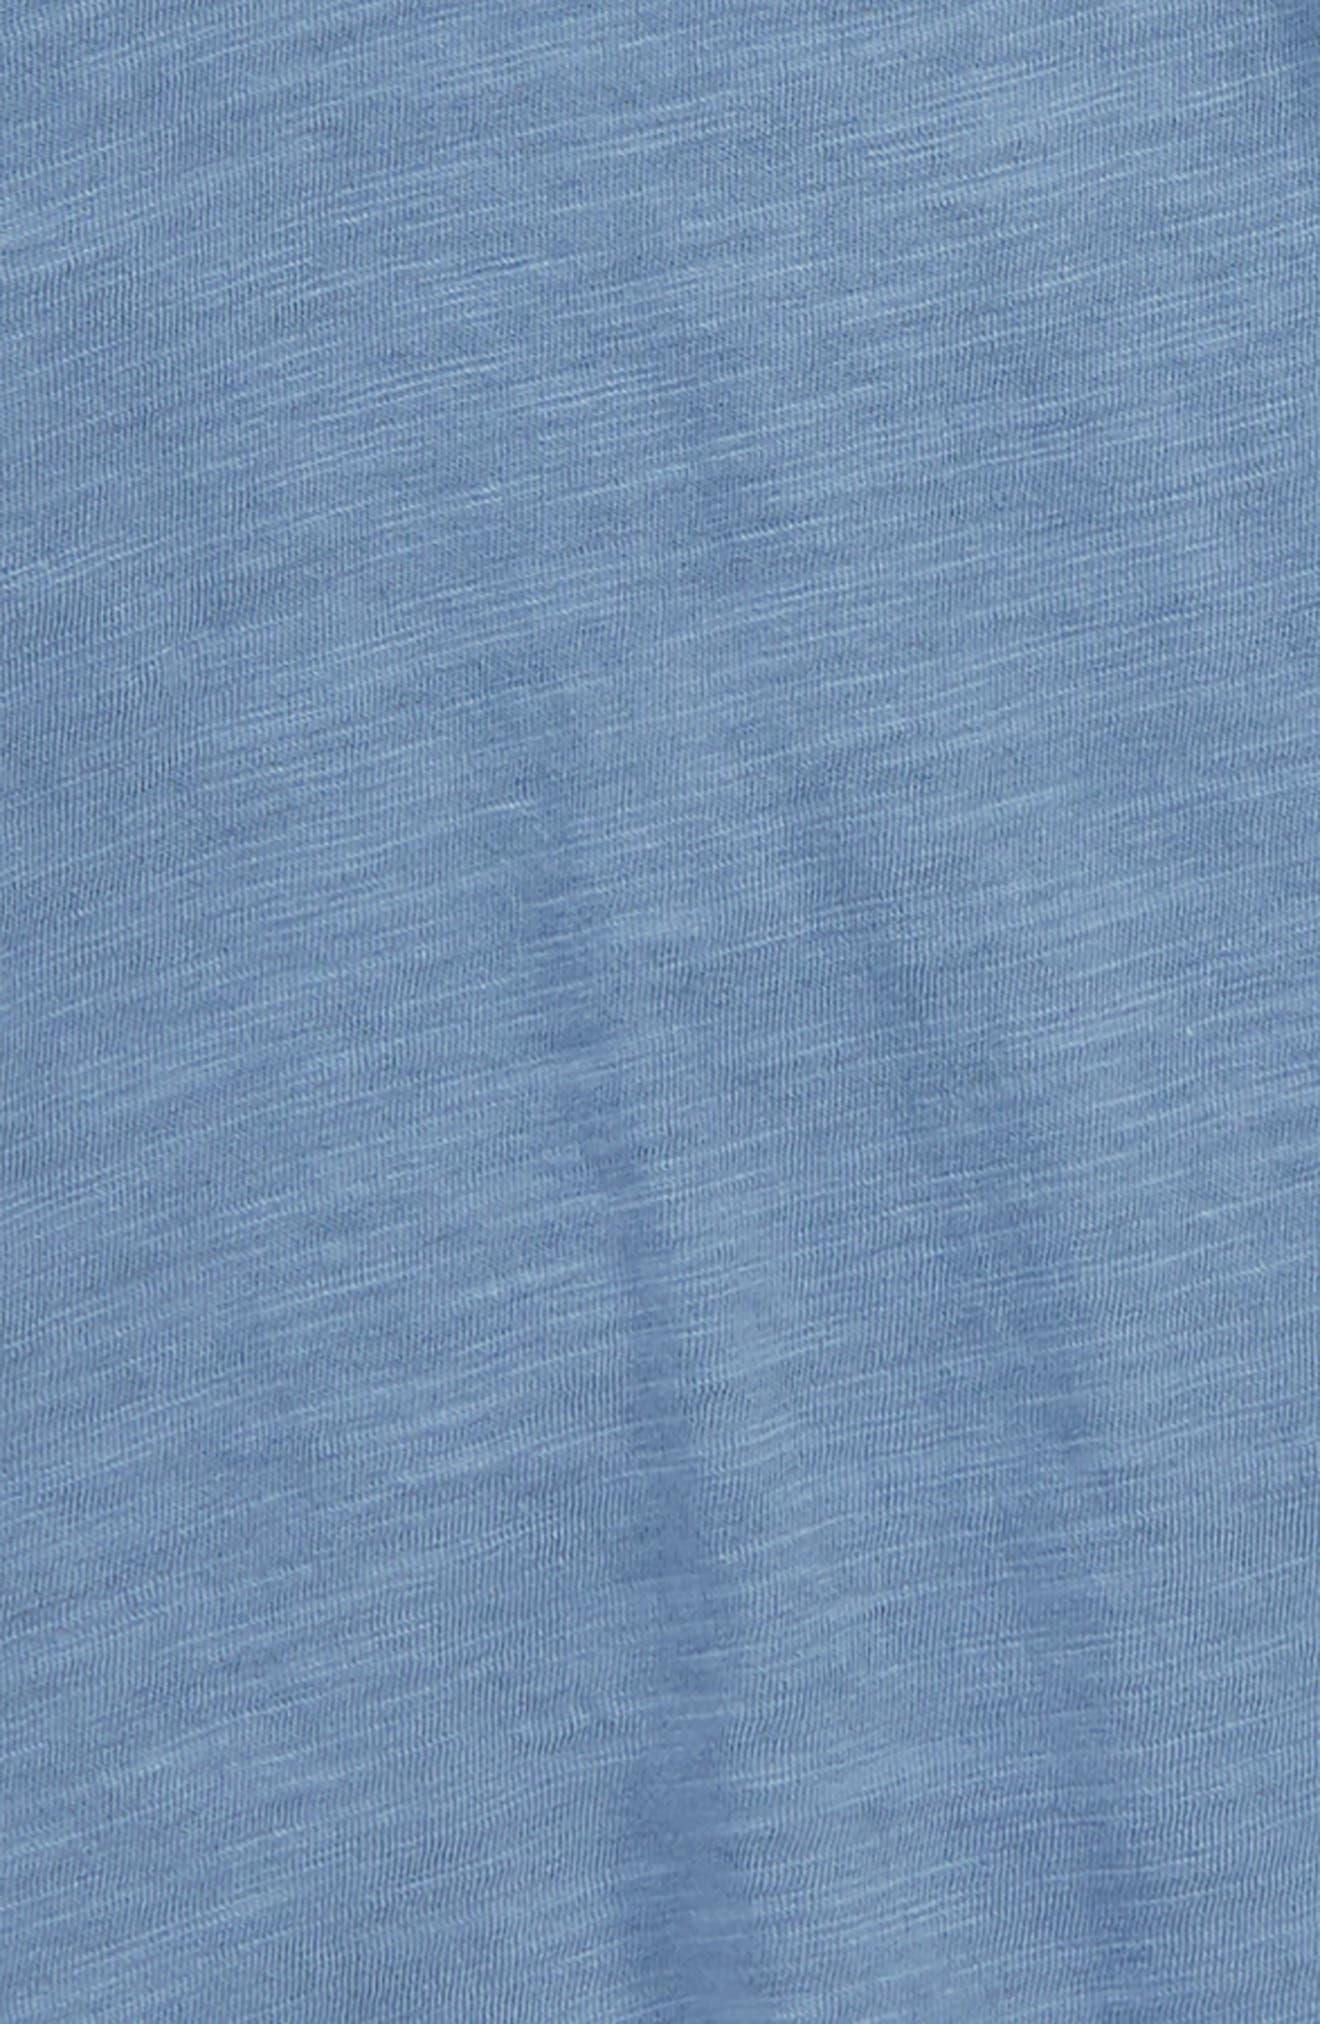 Short Sleeve Cotton T-Shirt,                             Alternate thumbnail 2, color,                             Blue Moonlight